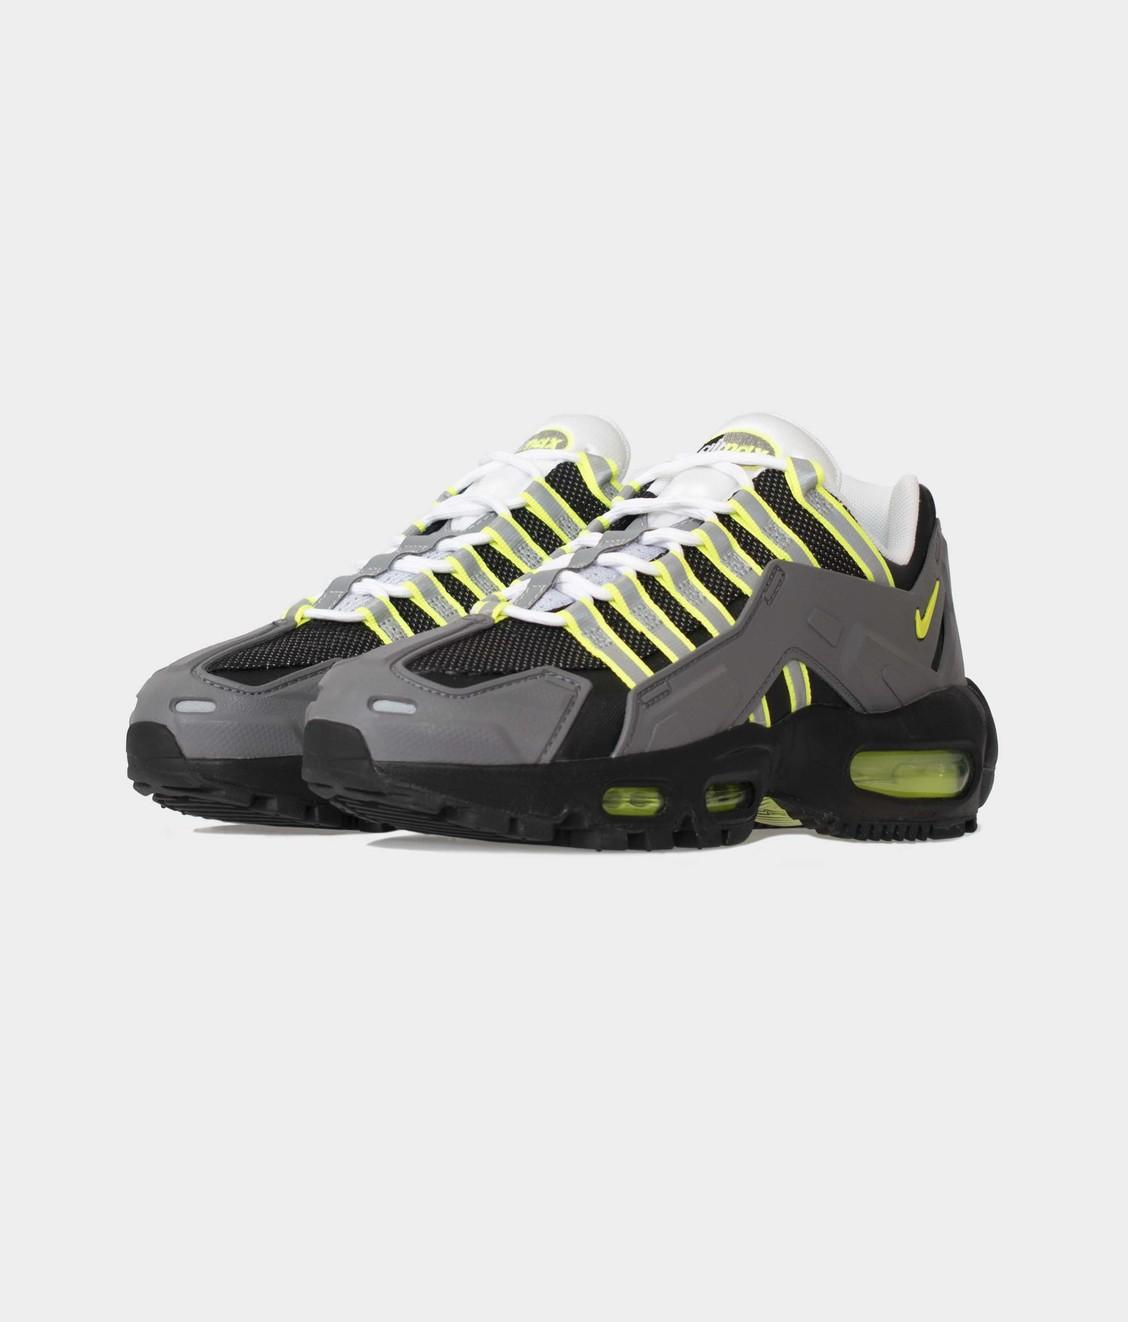 Nike Nike Air Max 95 NDSTRKT Black/Neon Yellow